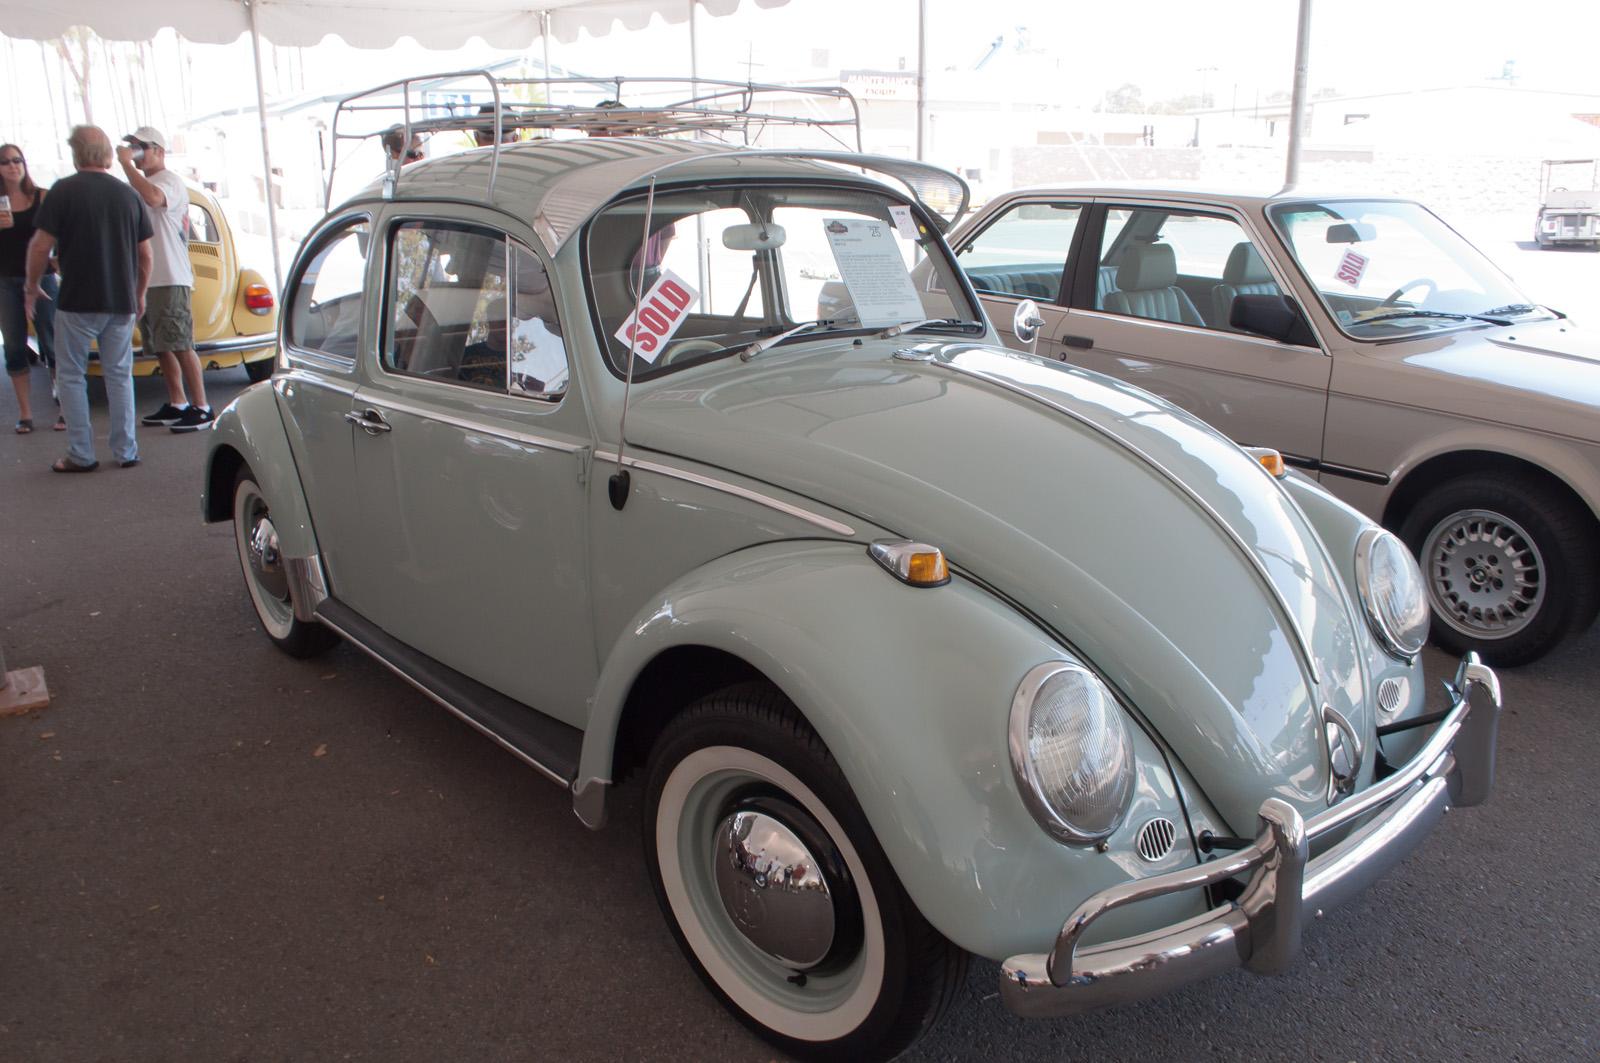 Volkswagenjetta also 2017 Volkswagen Passat Usa Alltrack further Old Chevrolet Alternator Wiring Diagram further Bmw 740 Li also File 1965 Volkswagen Beetle   Flickr   skinnylawyer. on volkswagen electrical system